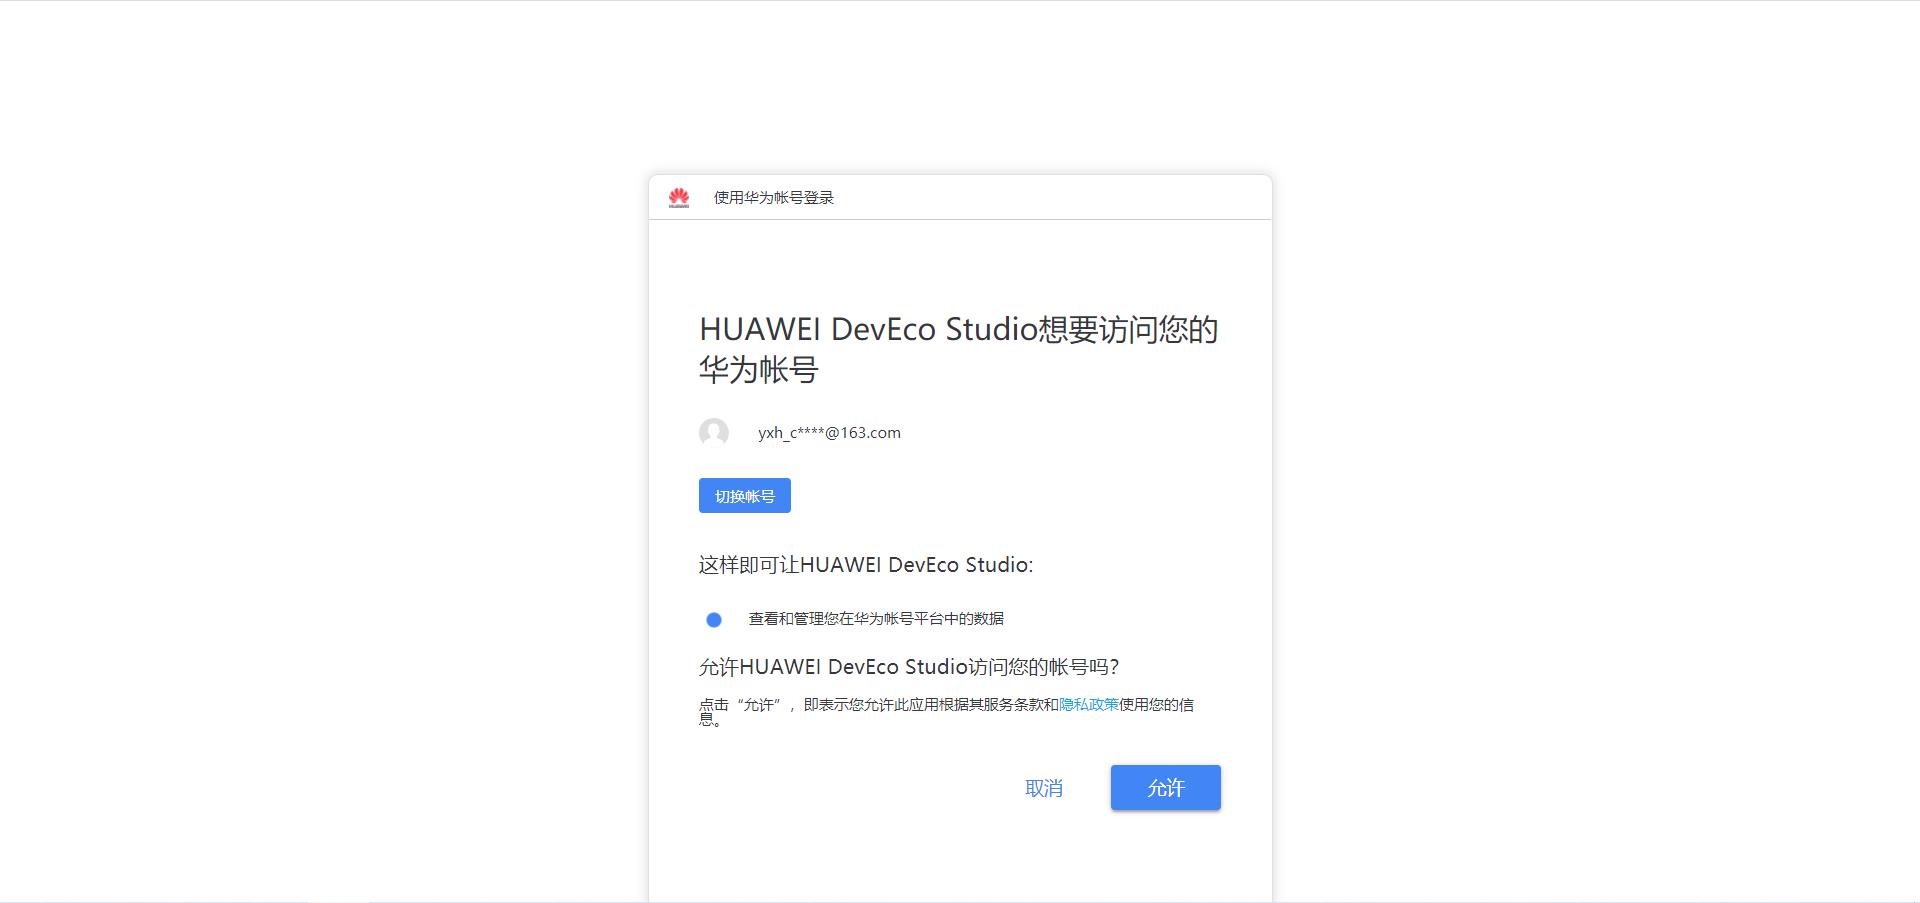 3a455c97aeefd15e1e7563273a17a012 - HarmonyOS(五)应用开发之创建第一个HelloWorld应用